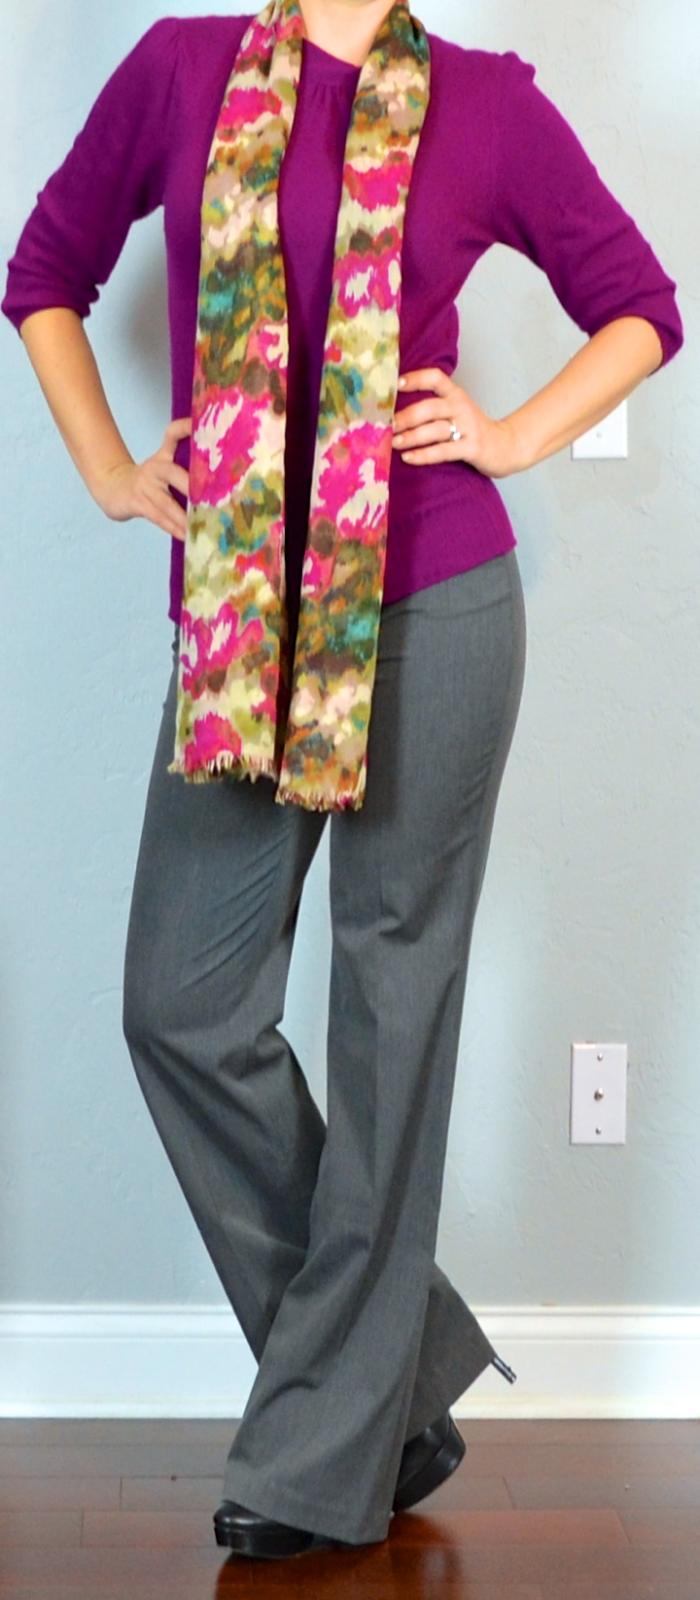 69bb0-purplefloralscarf